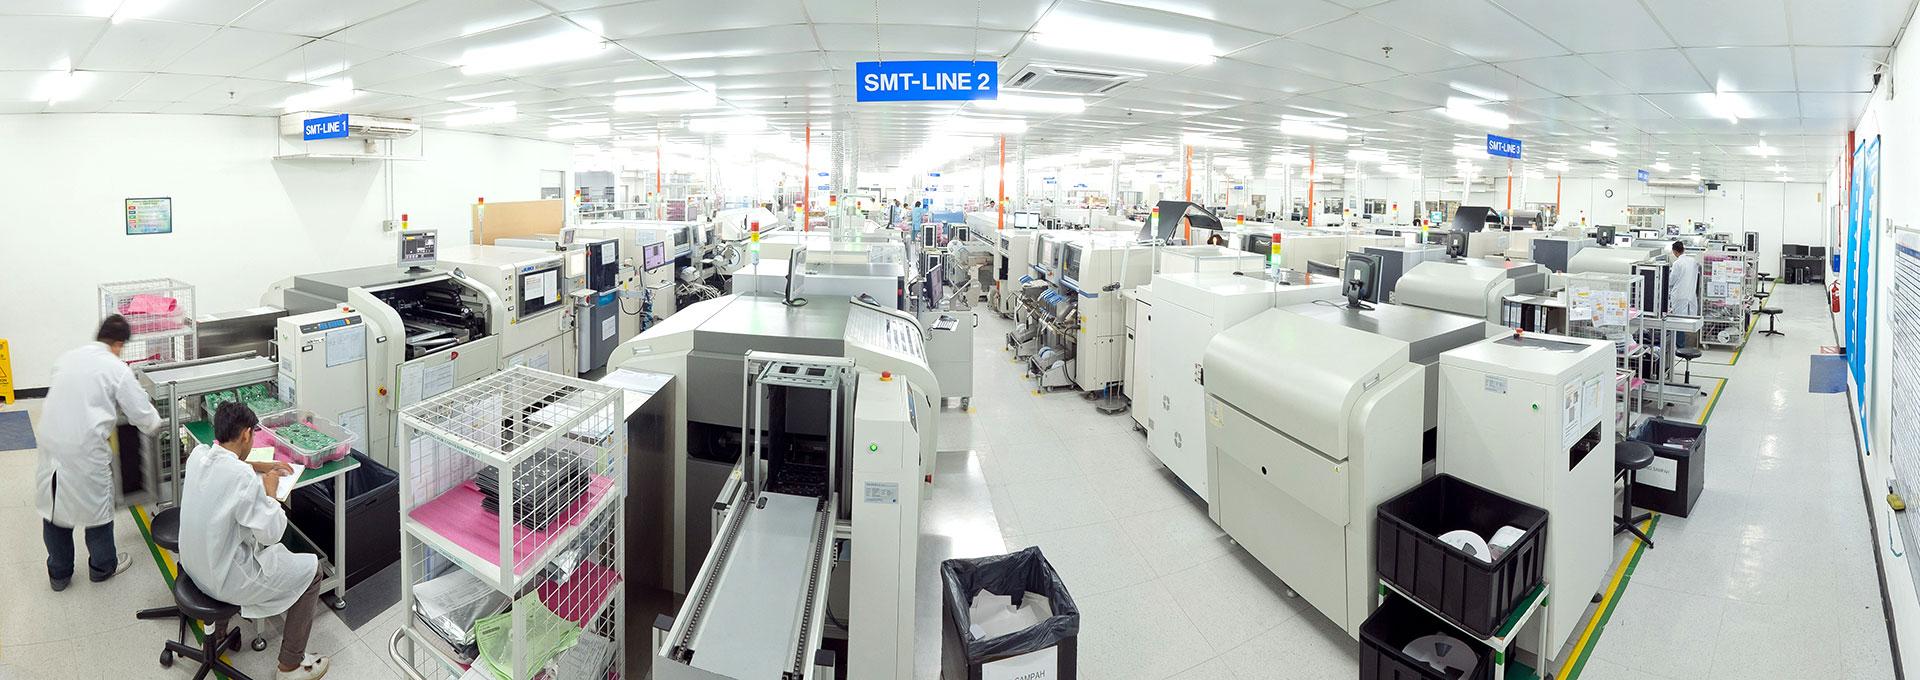 SMT factory MLS Automotive